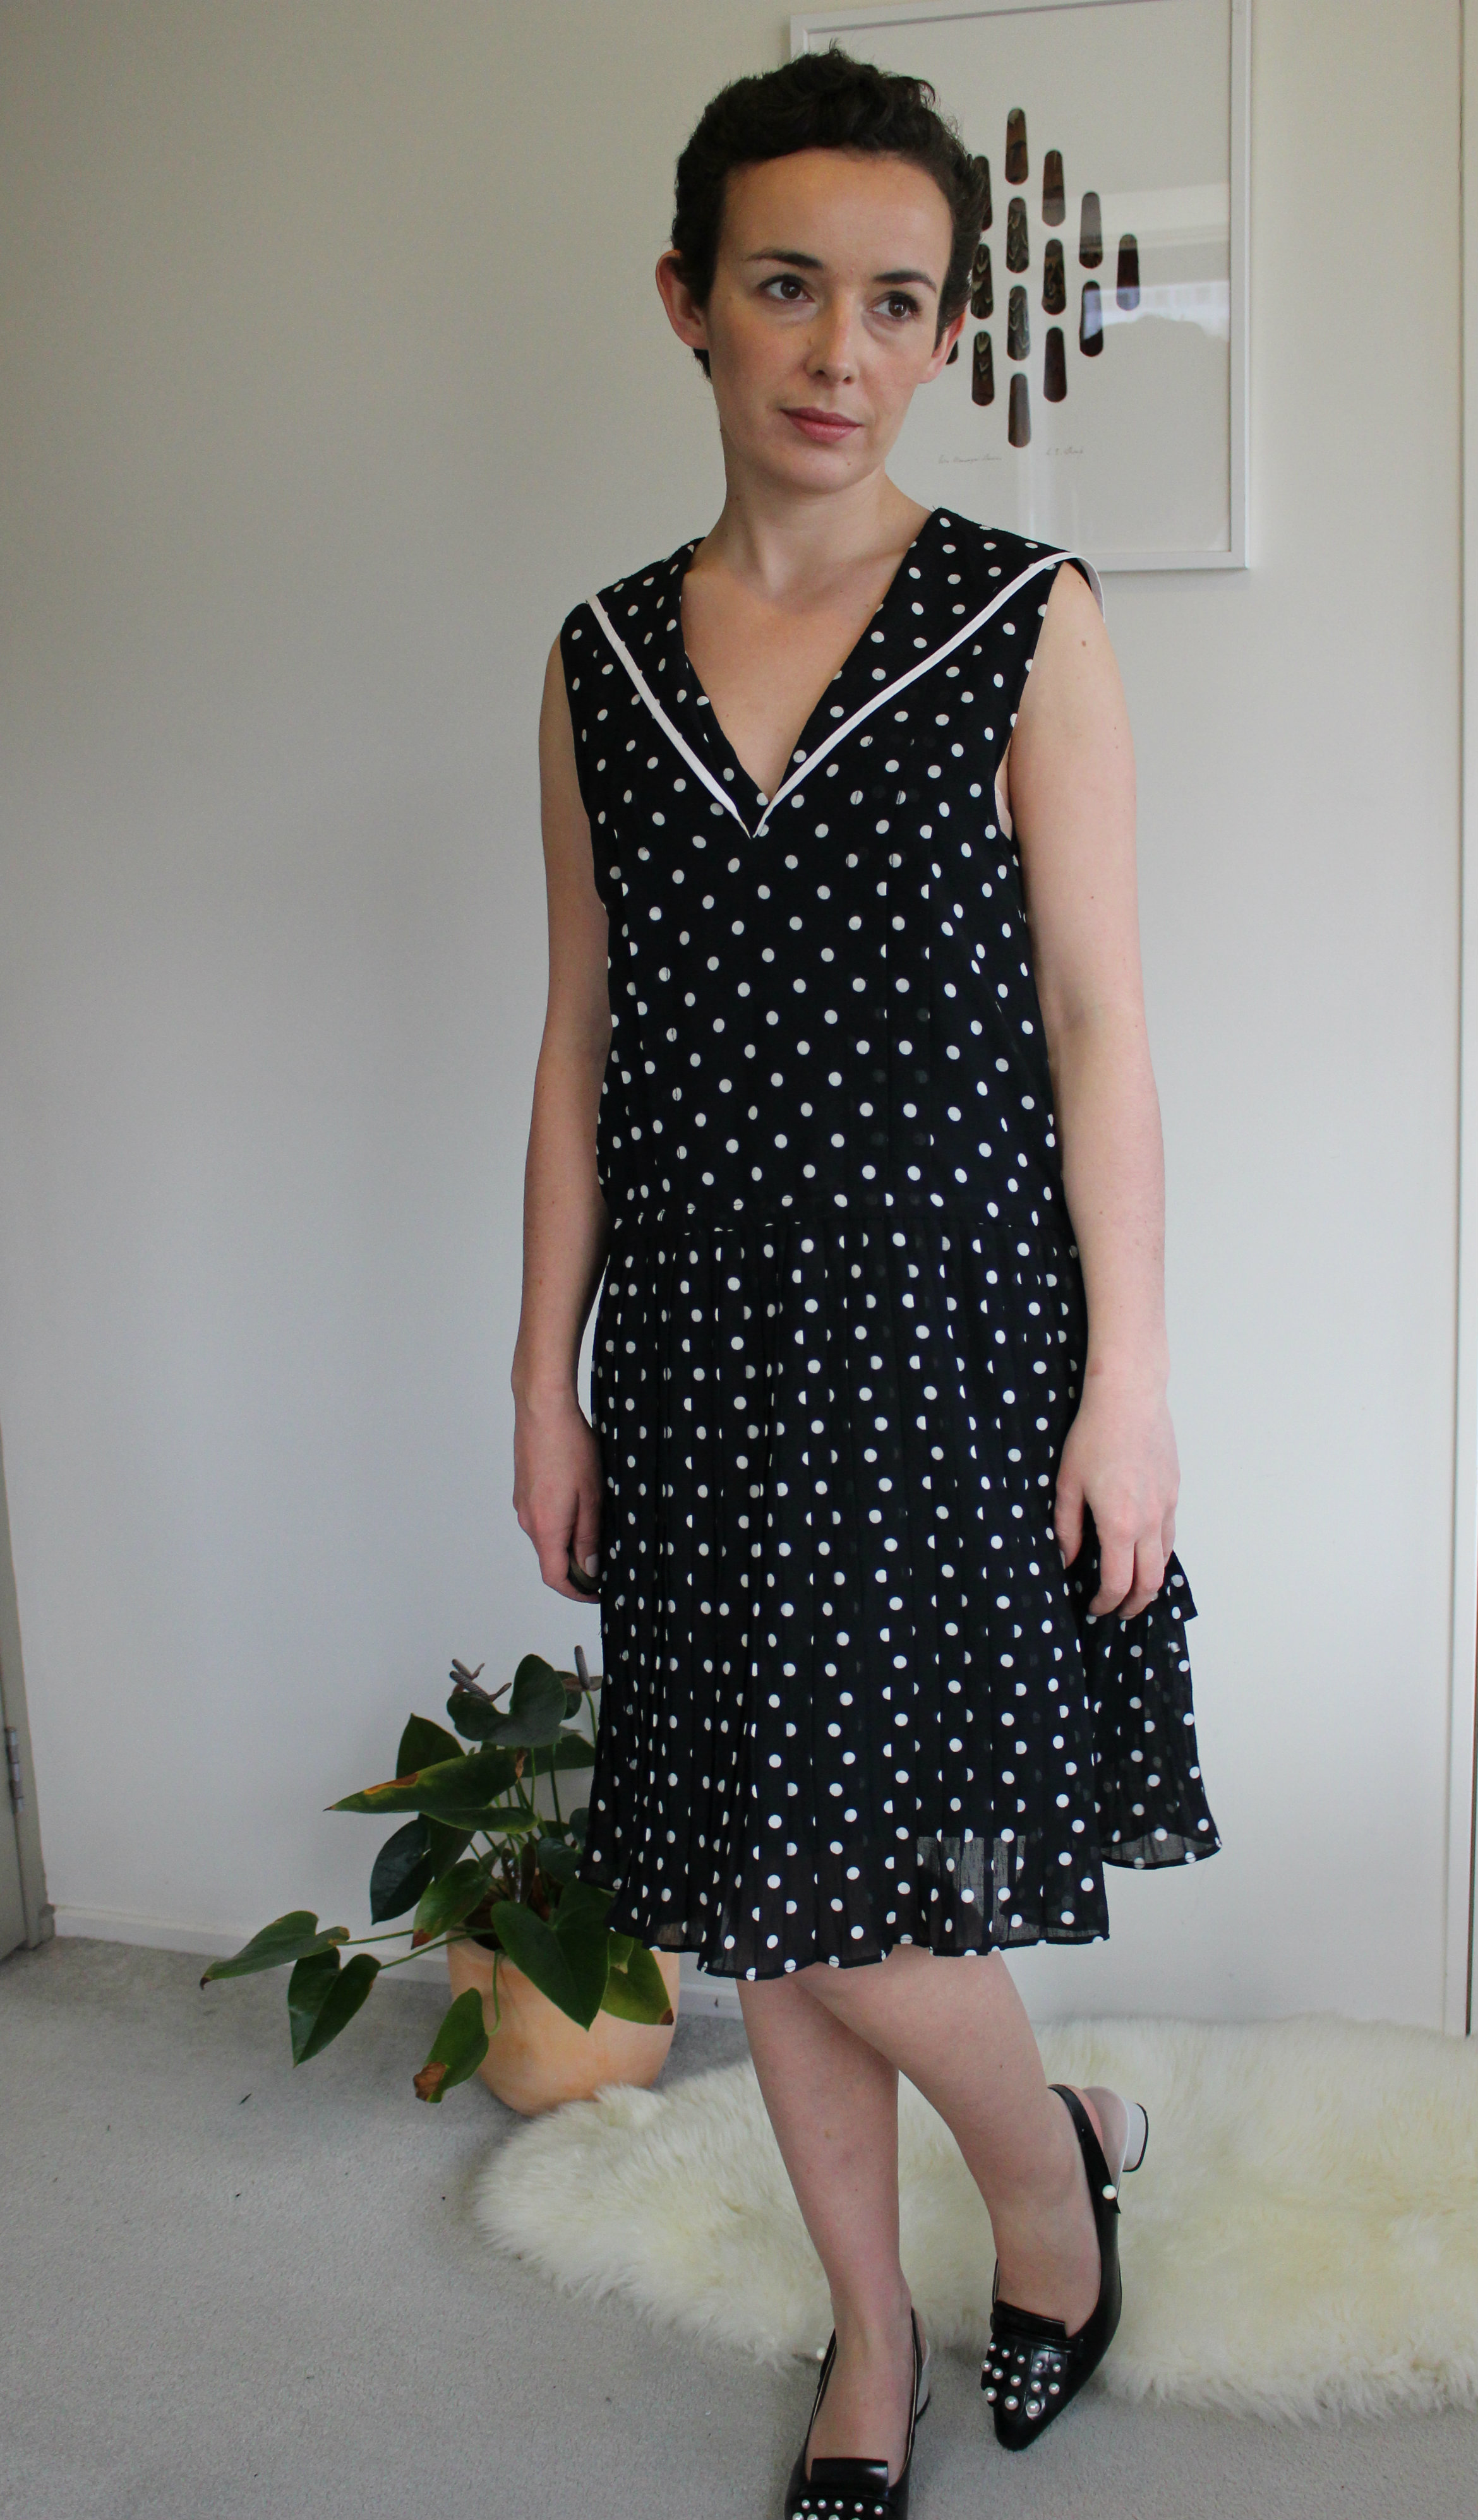 Dress: Smoove Reworked Vintage